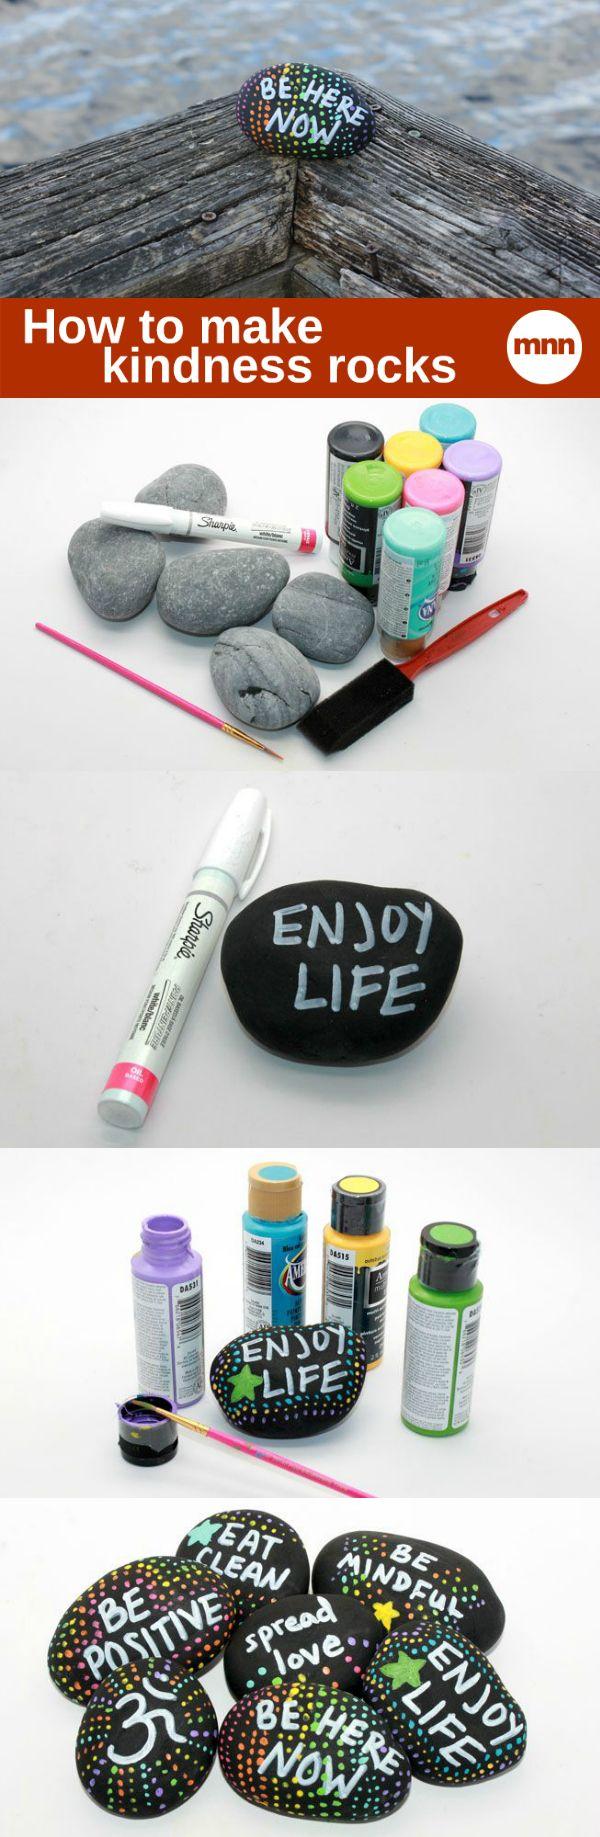 Share the love with diy random acts of kindness rocks for Random diys